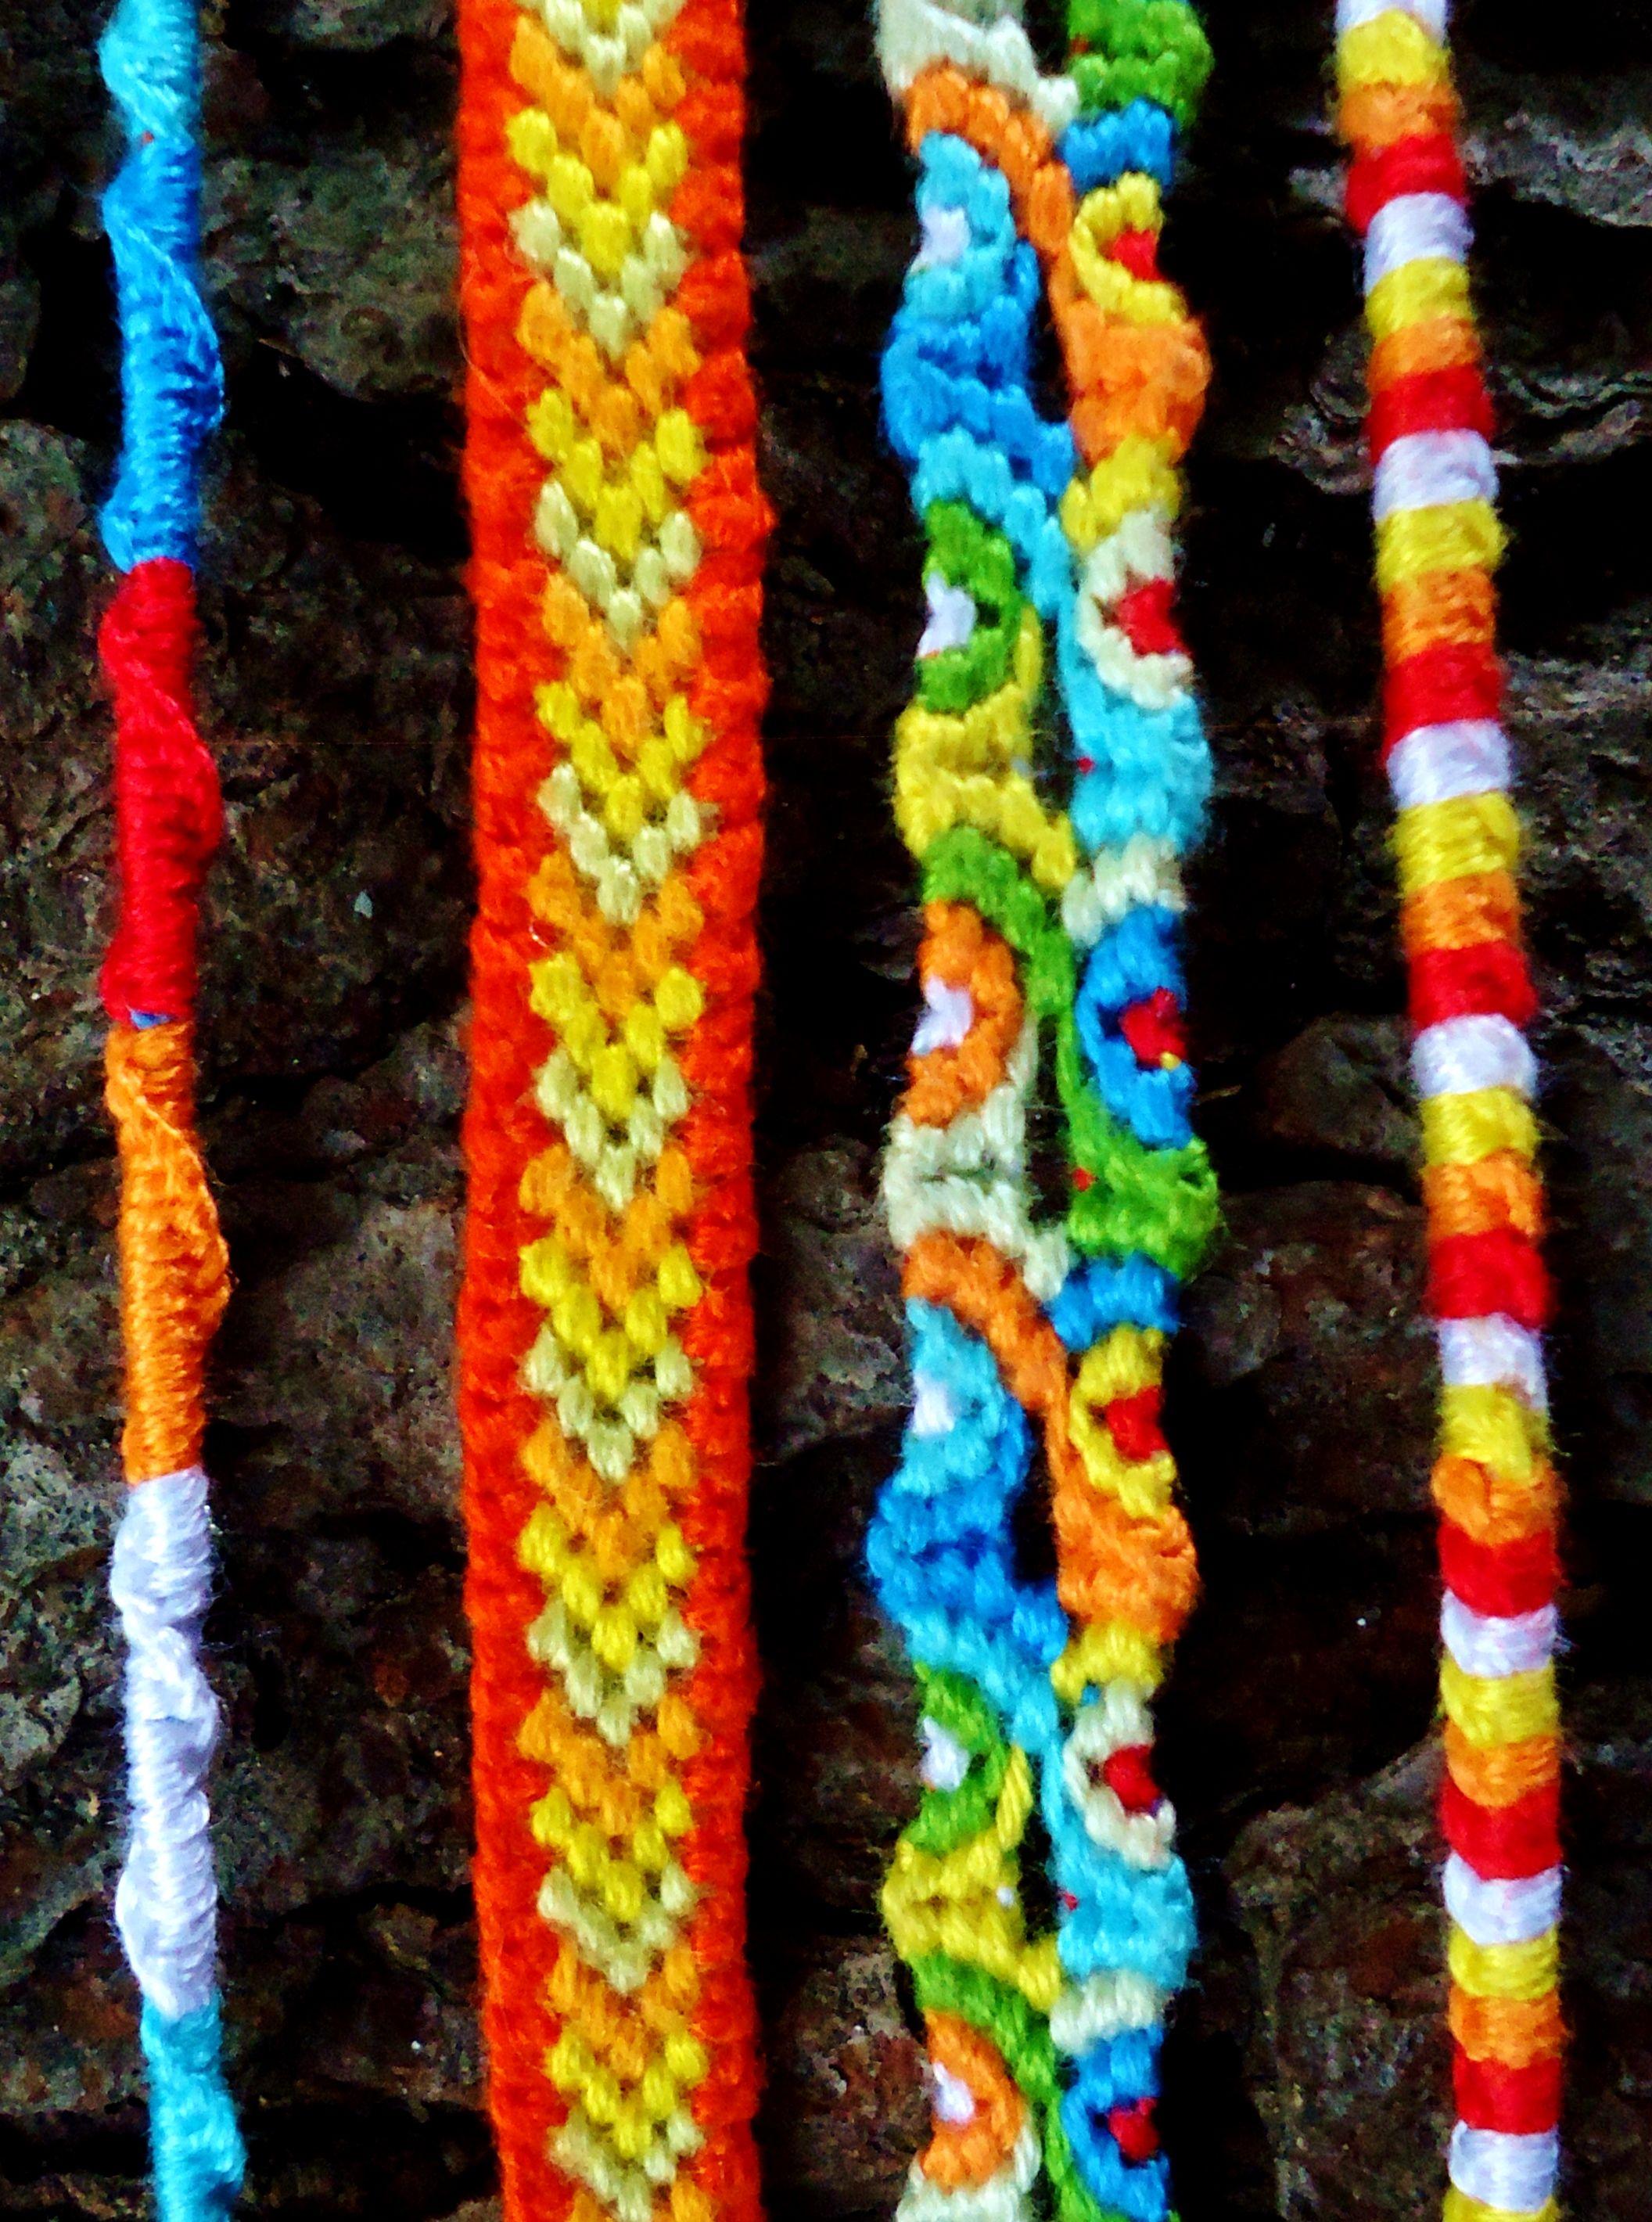 Camp Friendship Bracelets Single Strand, Bordered Chevron, Totem Pole And  Single Strand